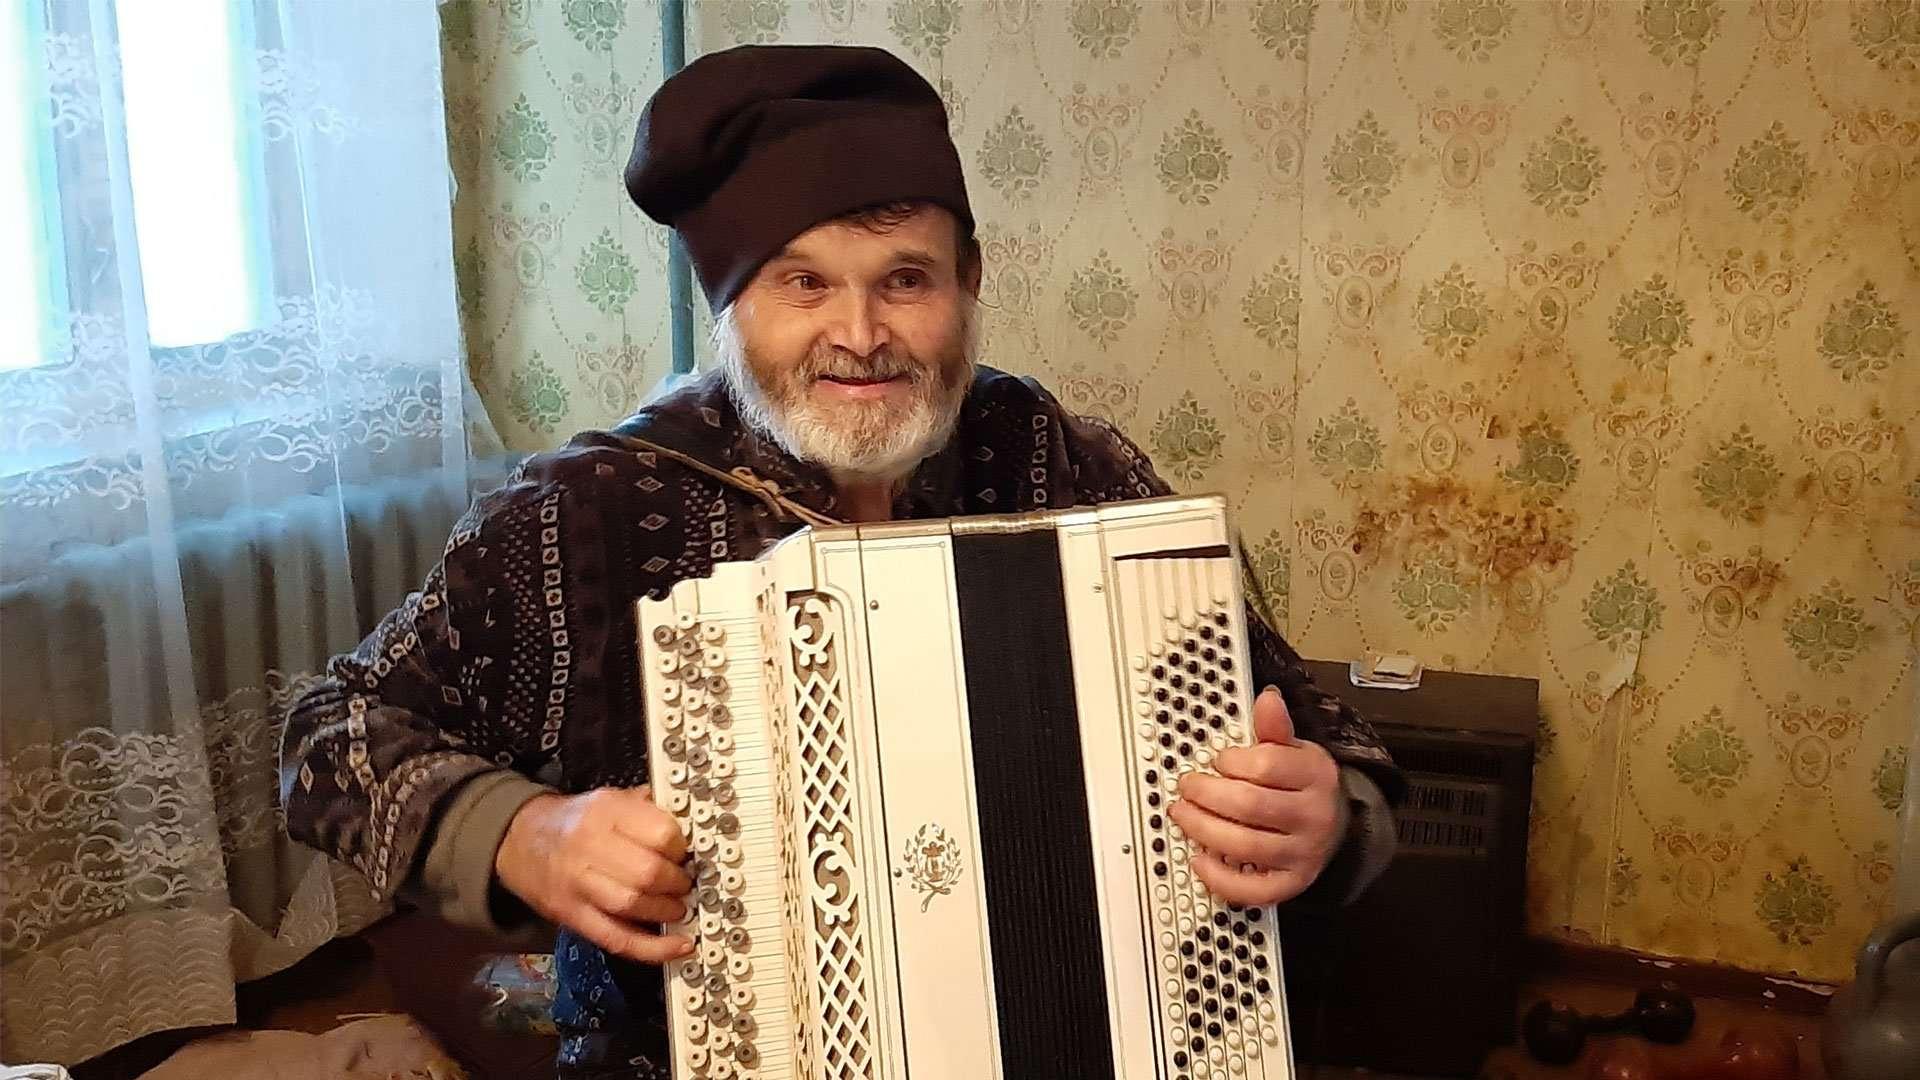 Vladimir - Ukrainian Jew - Holocuast Survivor